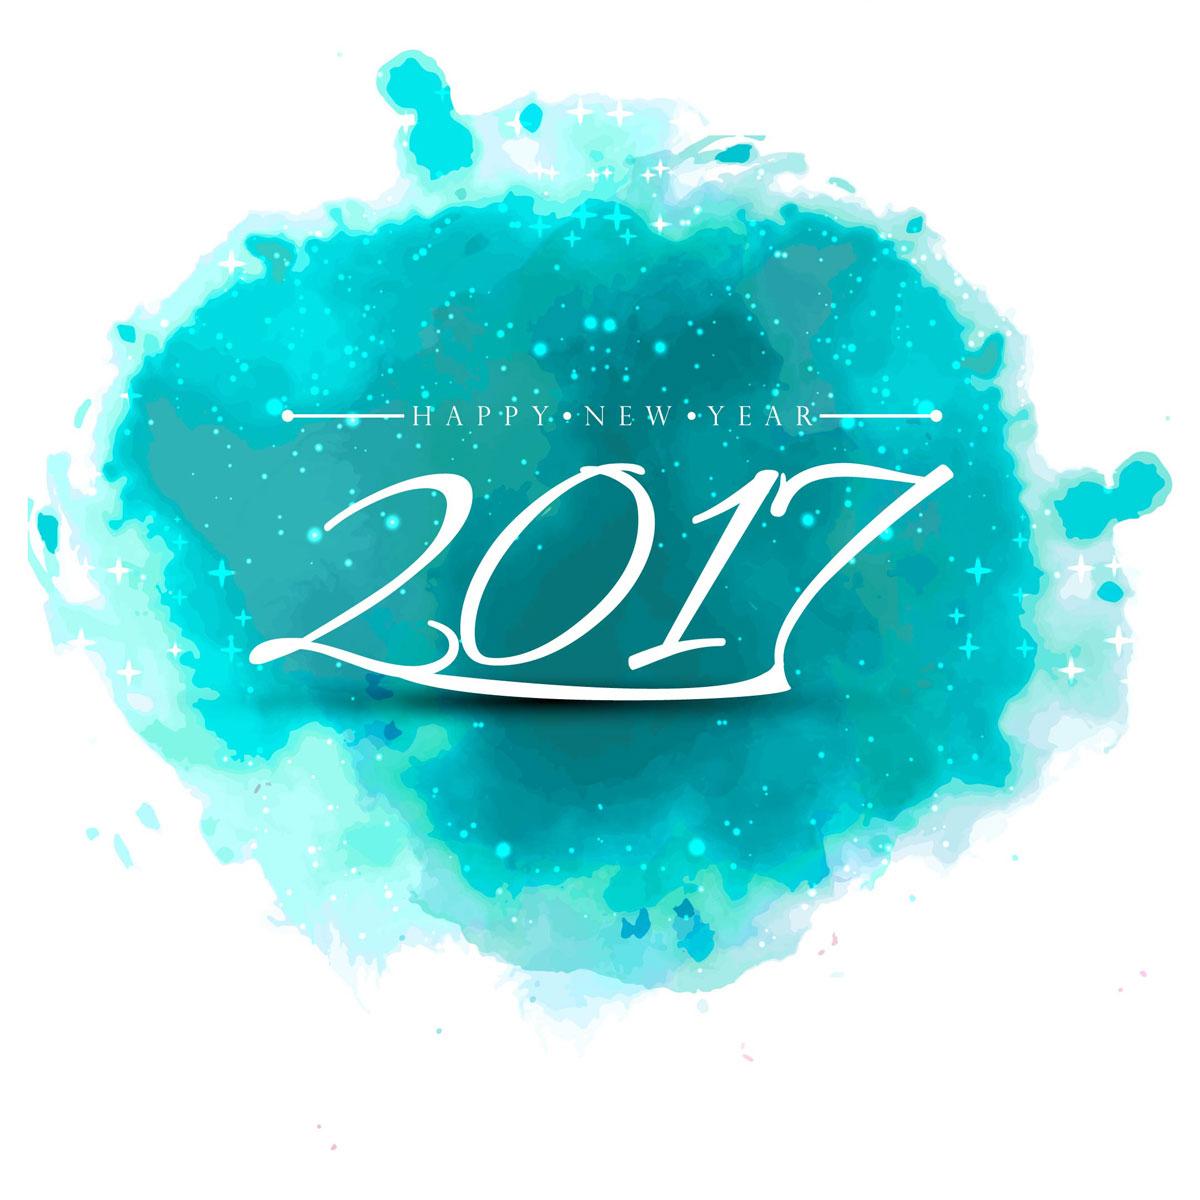 Happy new year 2017 wishes in marathi happy new year 2017 happy new year 2017 wishes in marathi kristyandbryce Gallery